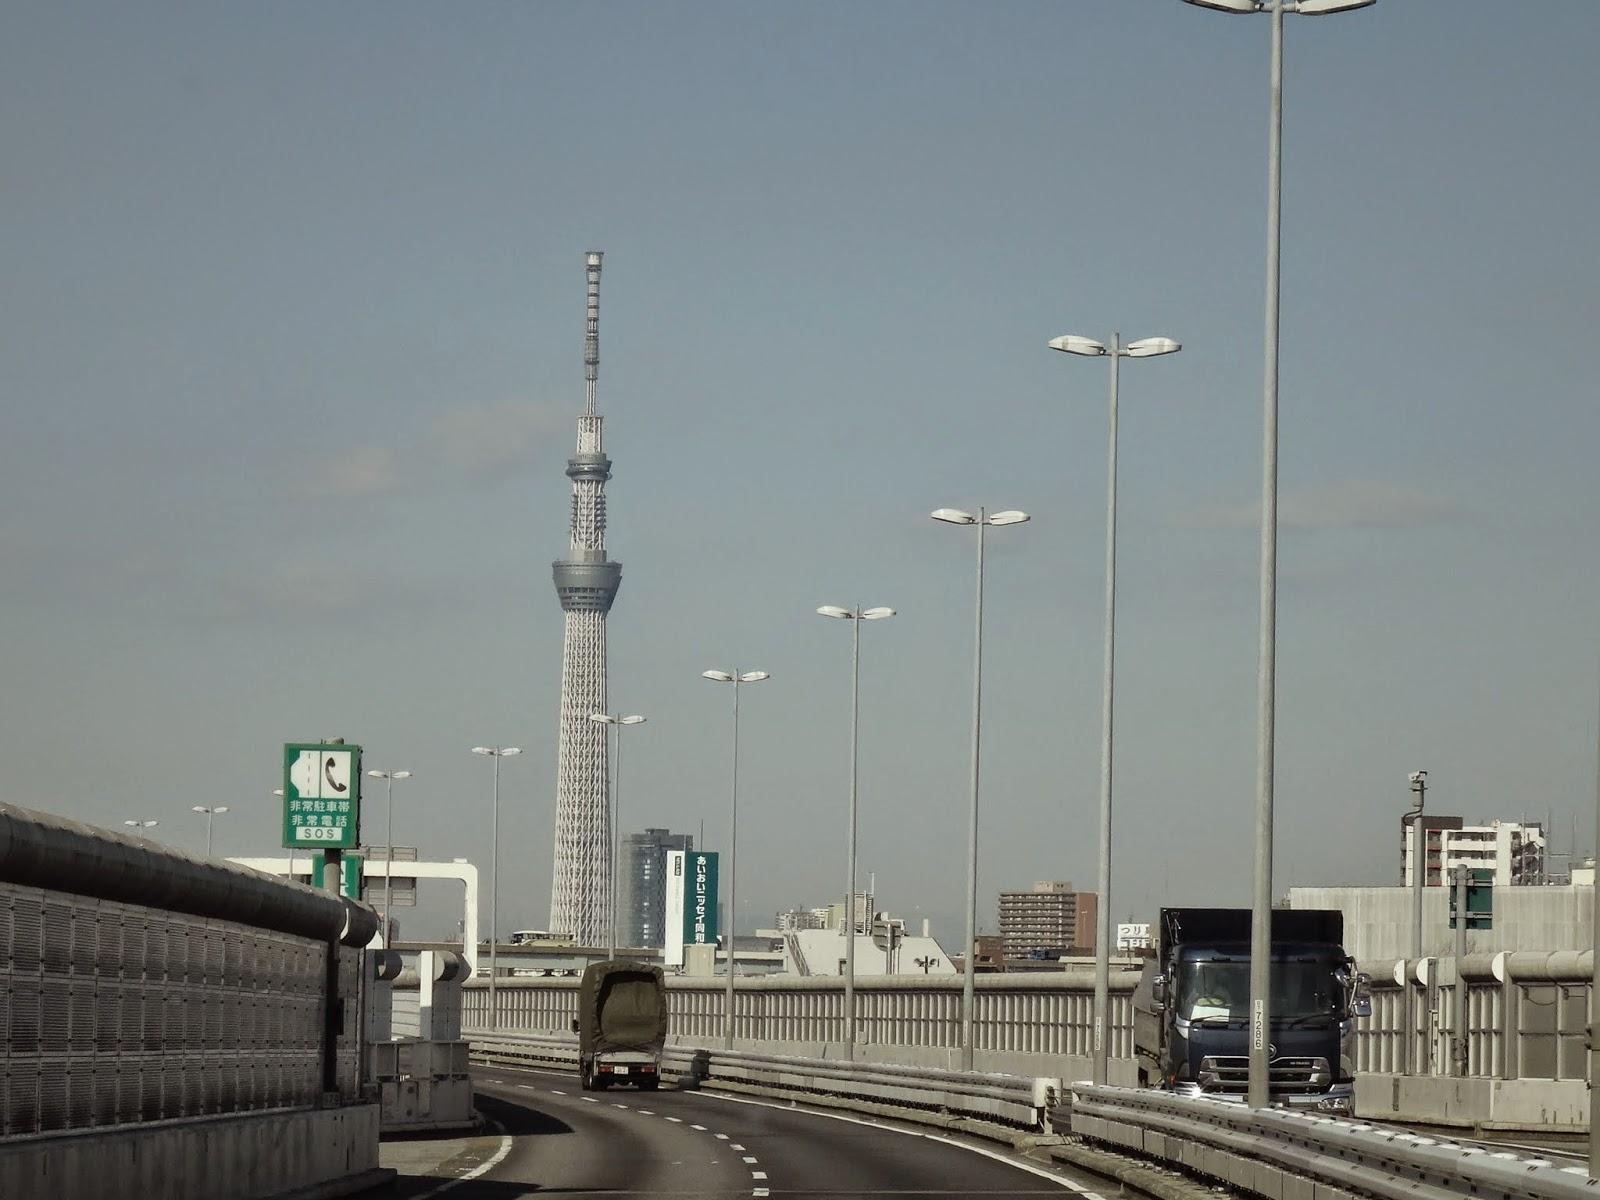 As soon as we see Tokyo Skytree, we know we are reaching Tokyo downtown from Narita International Airport in Tokyo, Japan